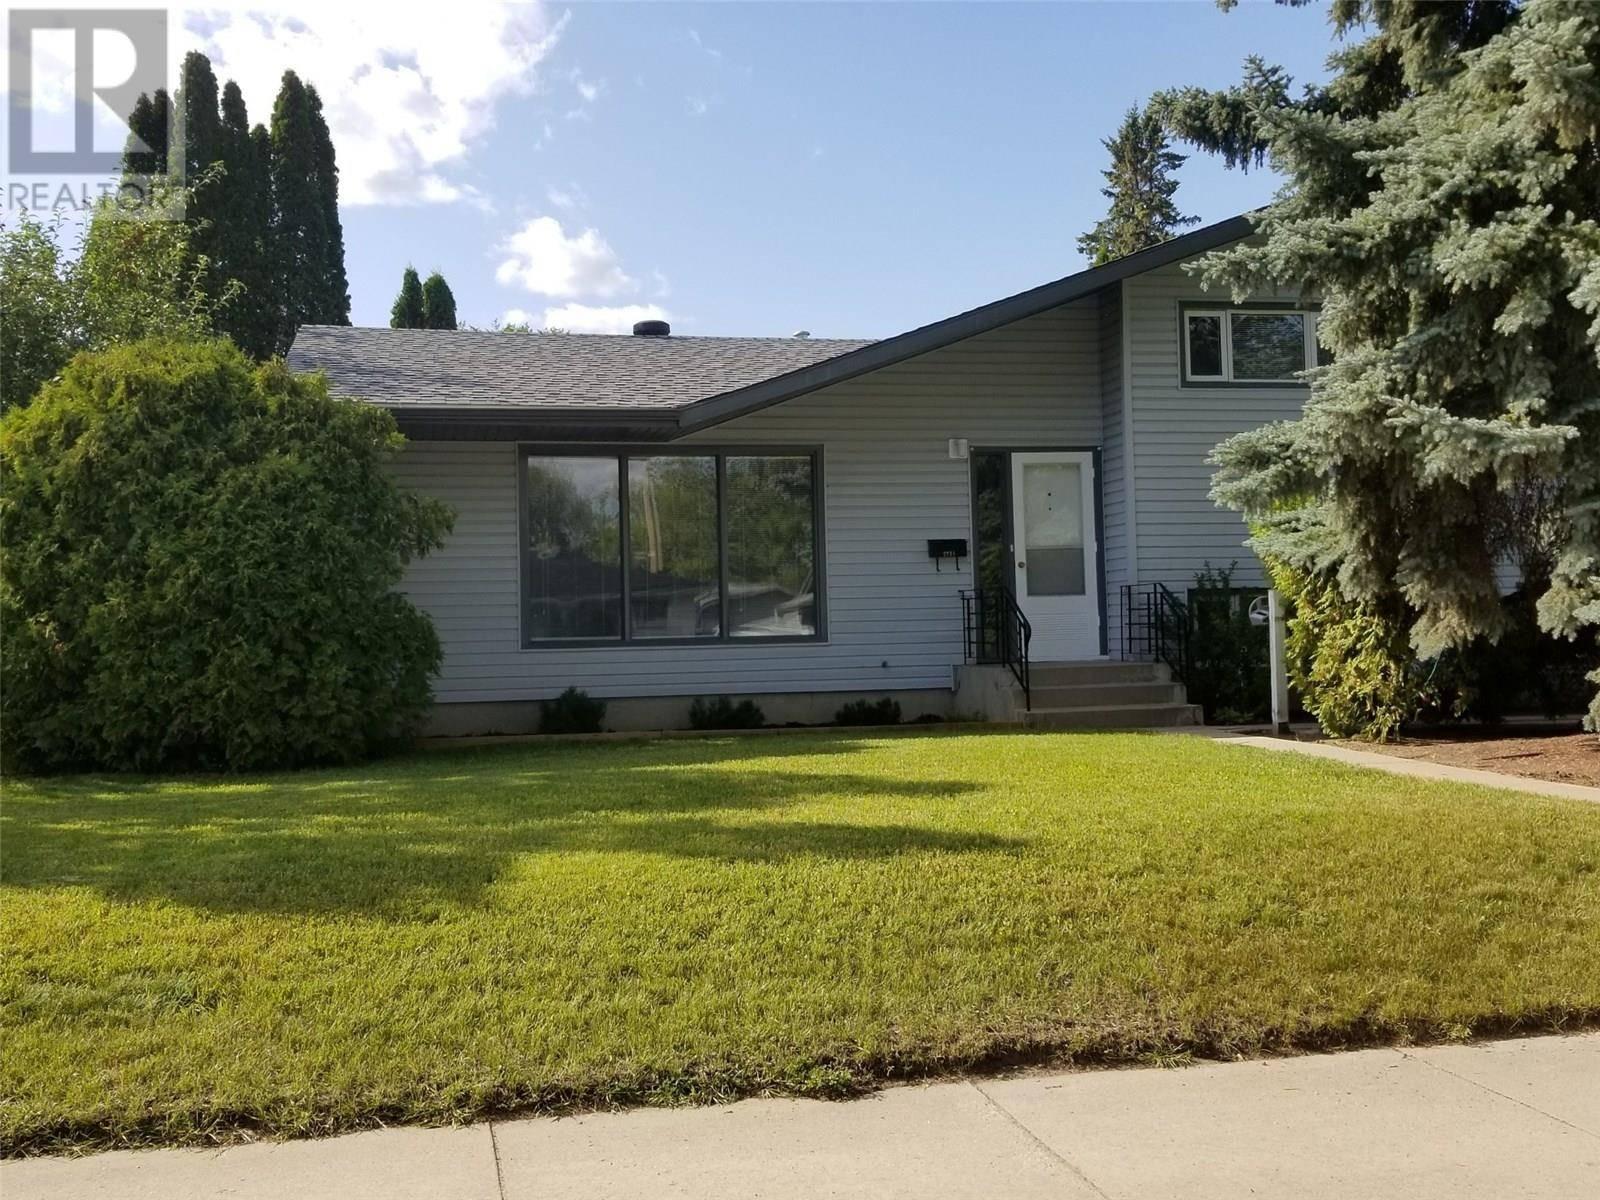 House for sale at 2221 Louise Ave Saskatoon Saskatchewan - MLS: SK783030